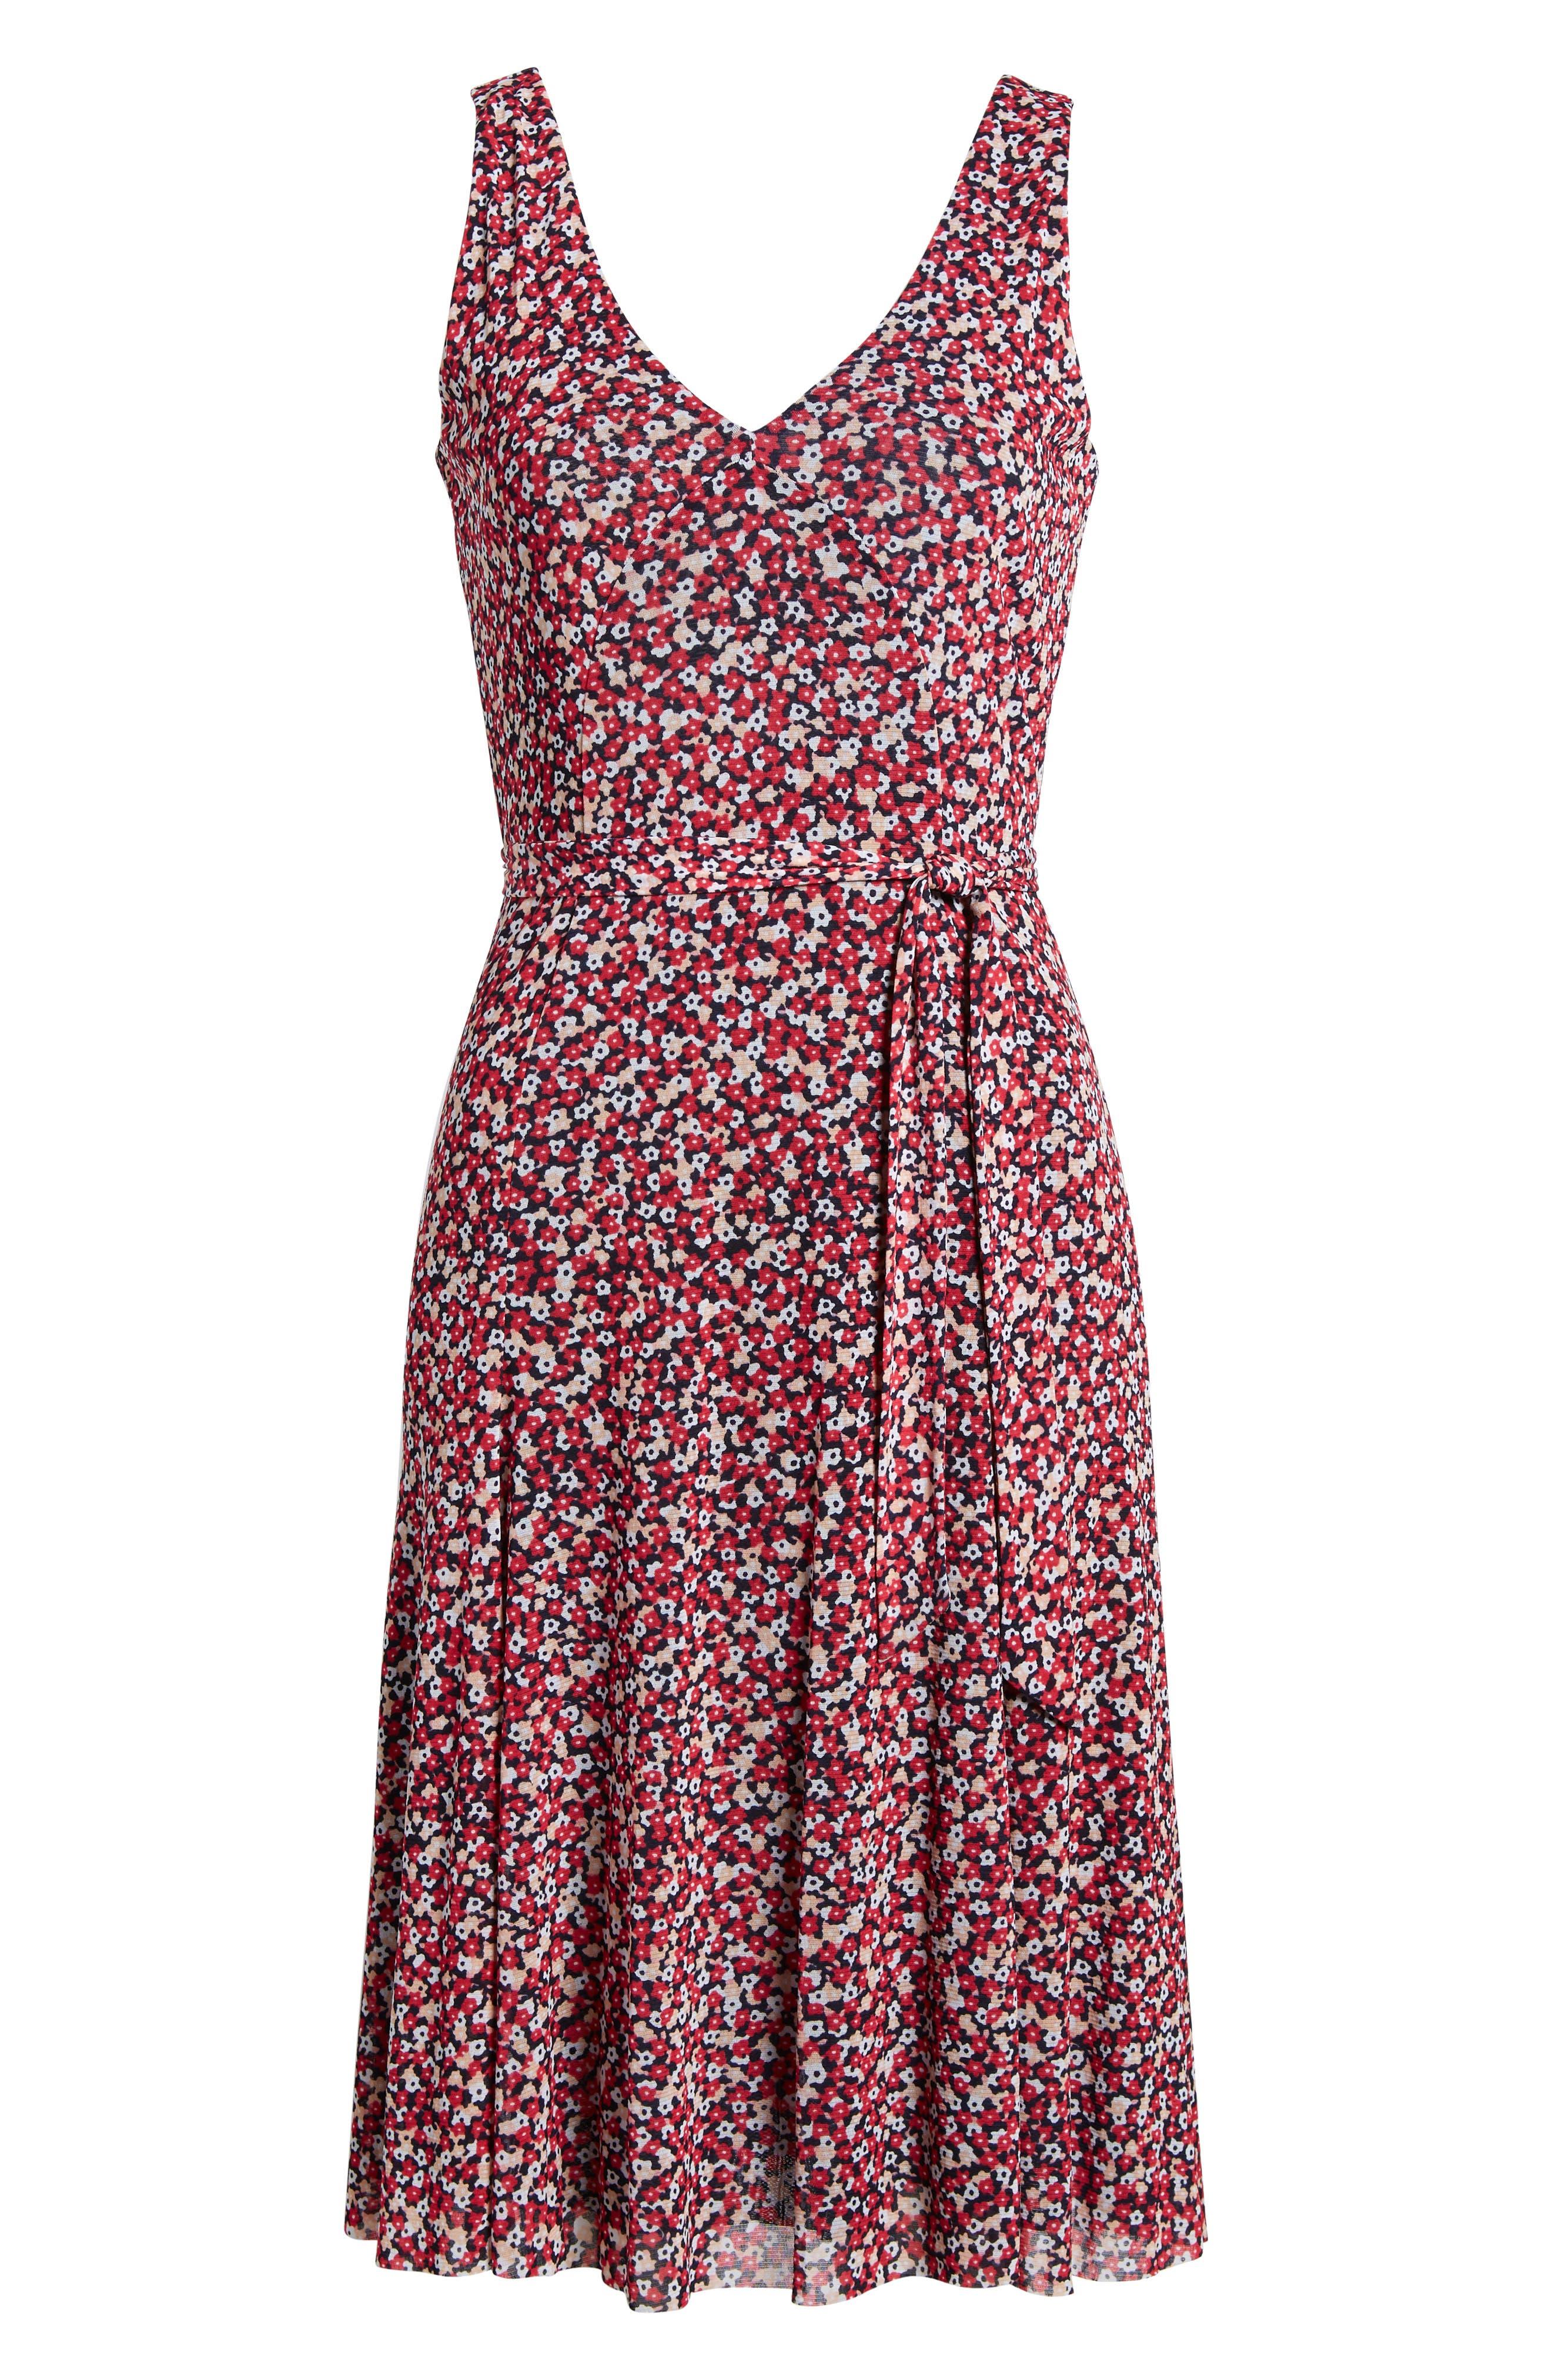 Floral Tank Dress,                             Alternate thumbnail 6, color,                             True Navy/ Bright Blush